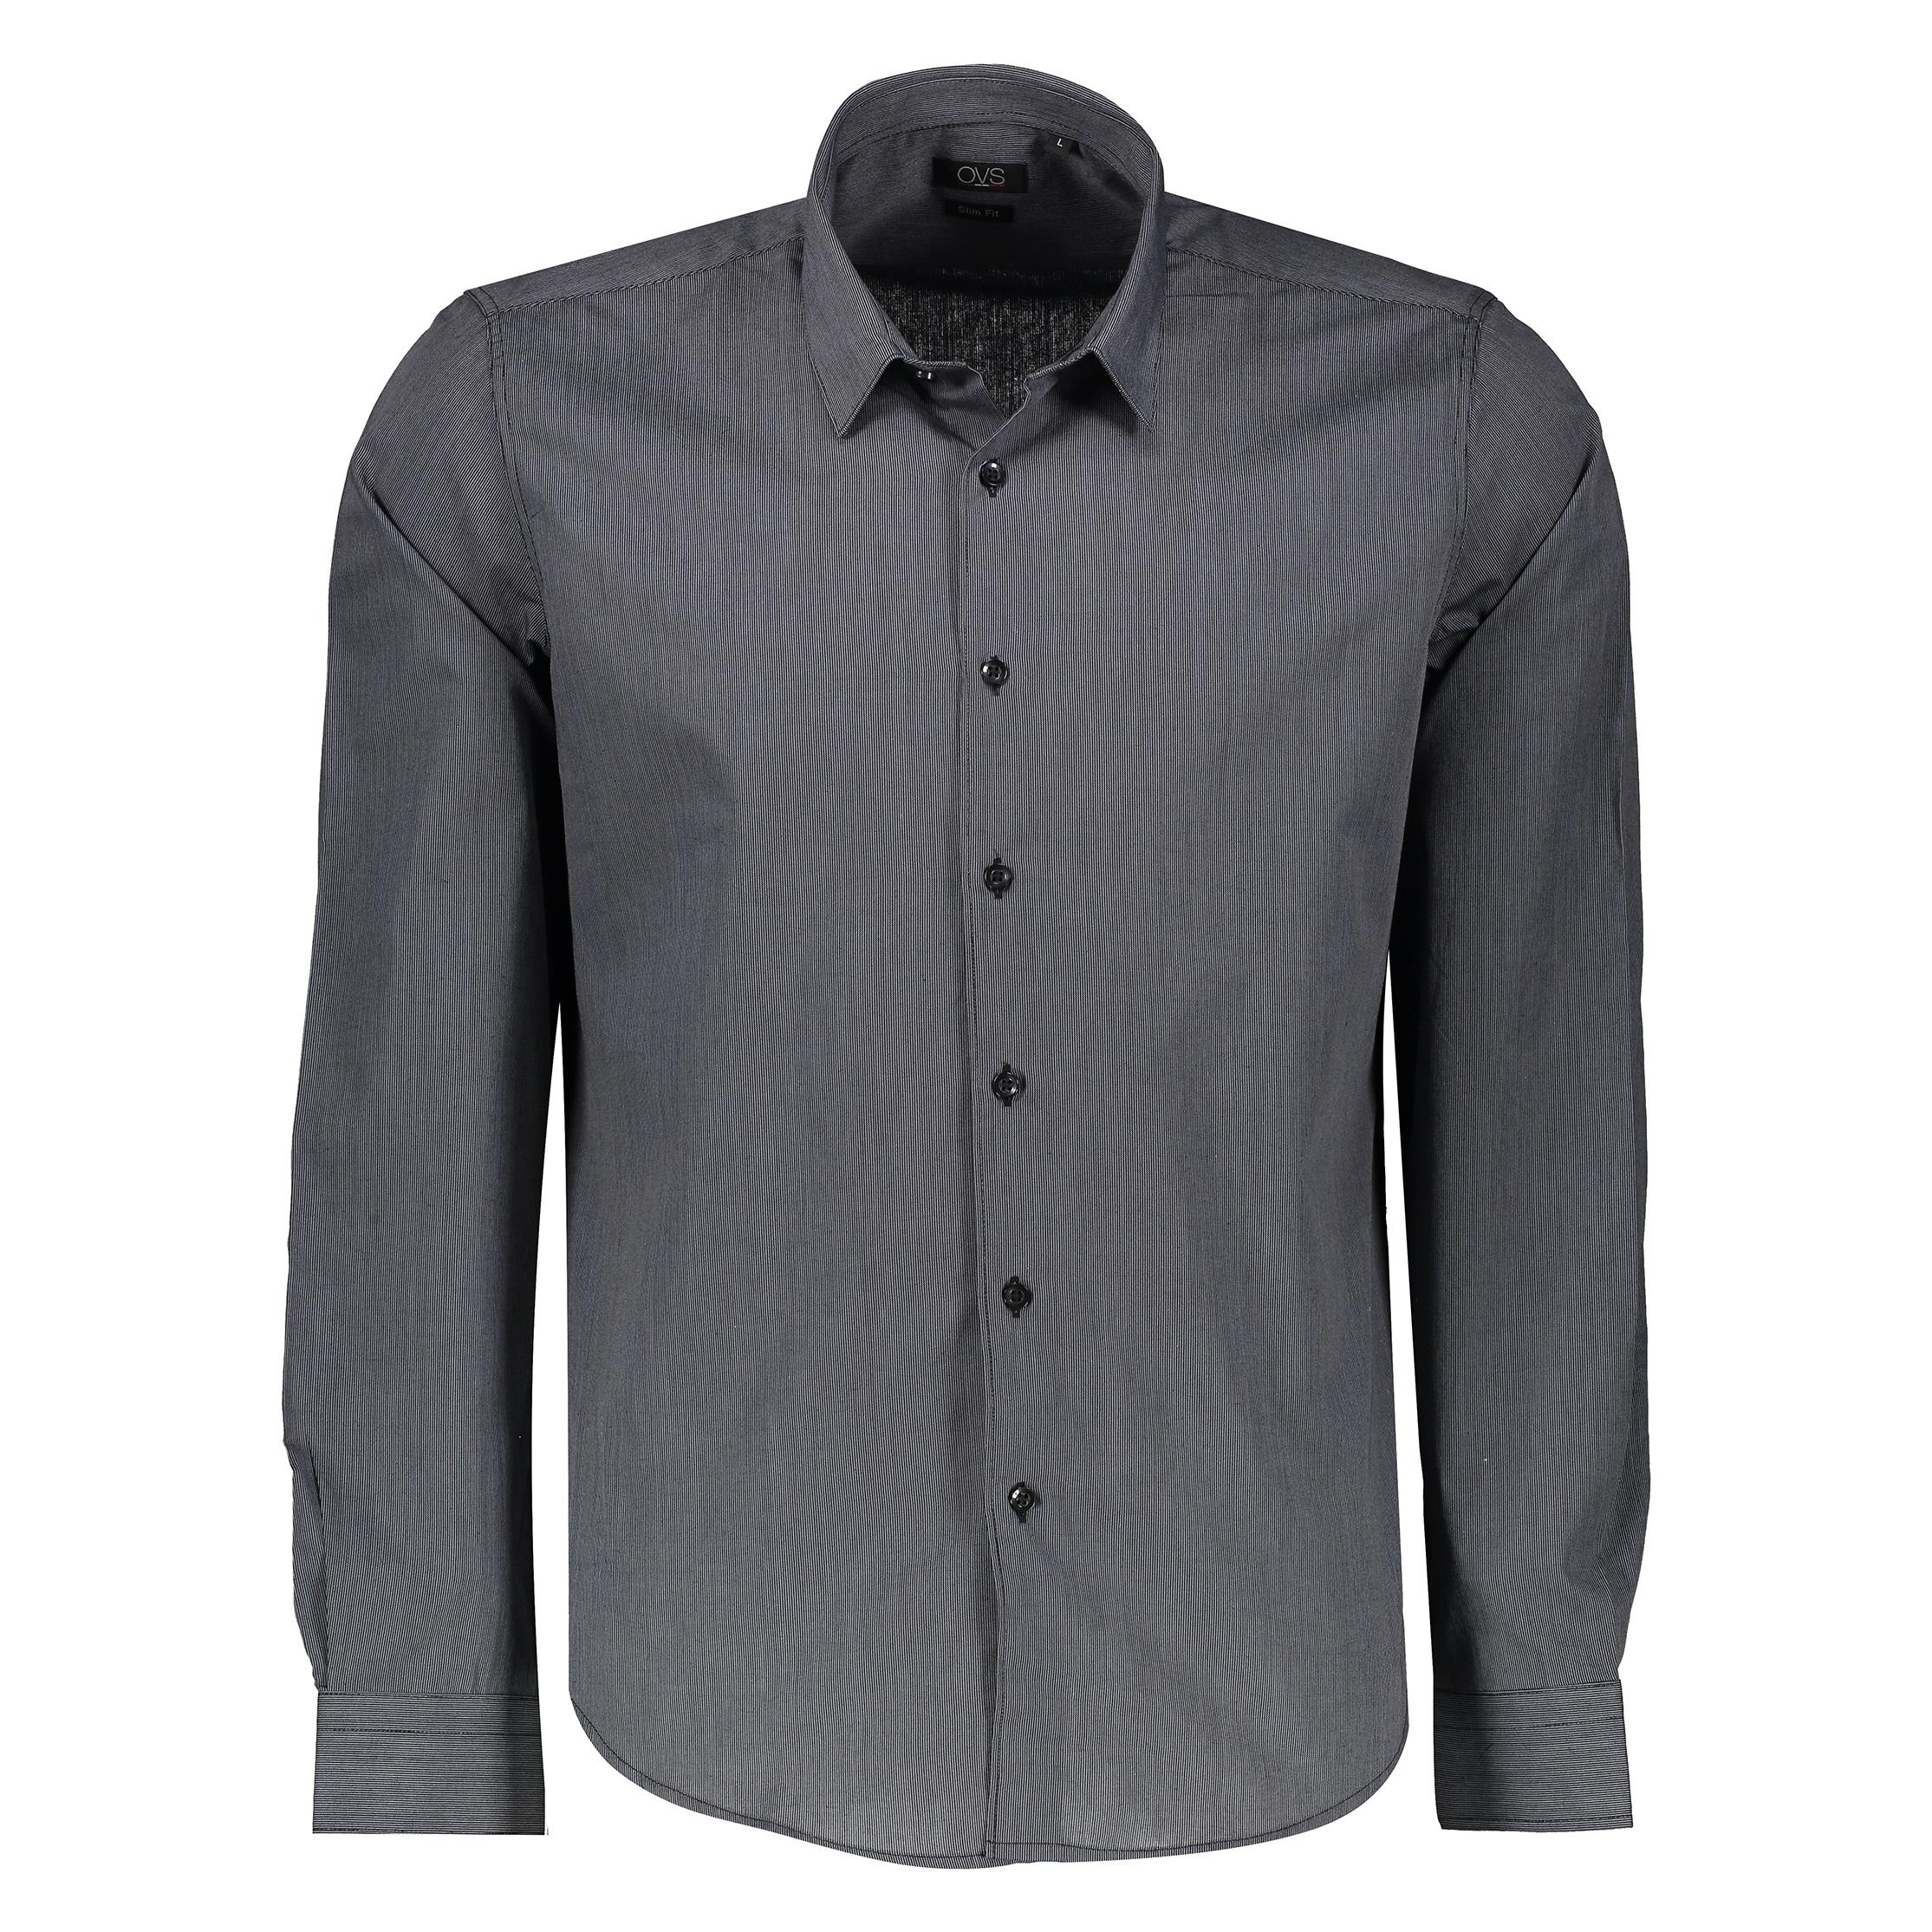 پیراهن مردانه او وی اس مدل 03375238-BLACK-STRIPED GREY0